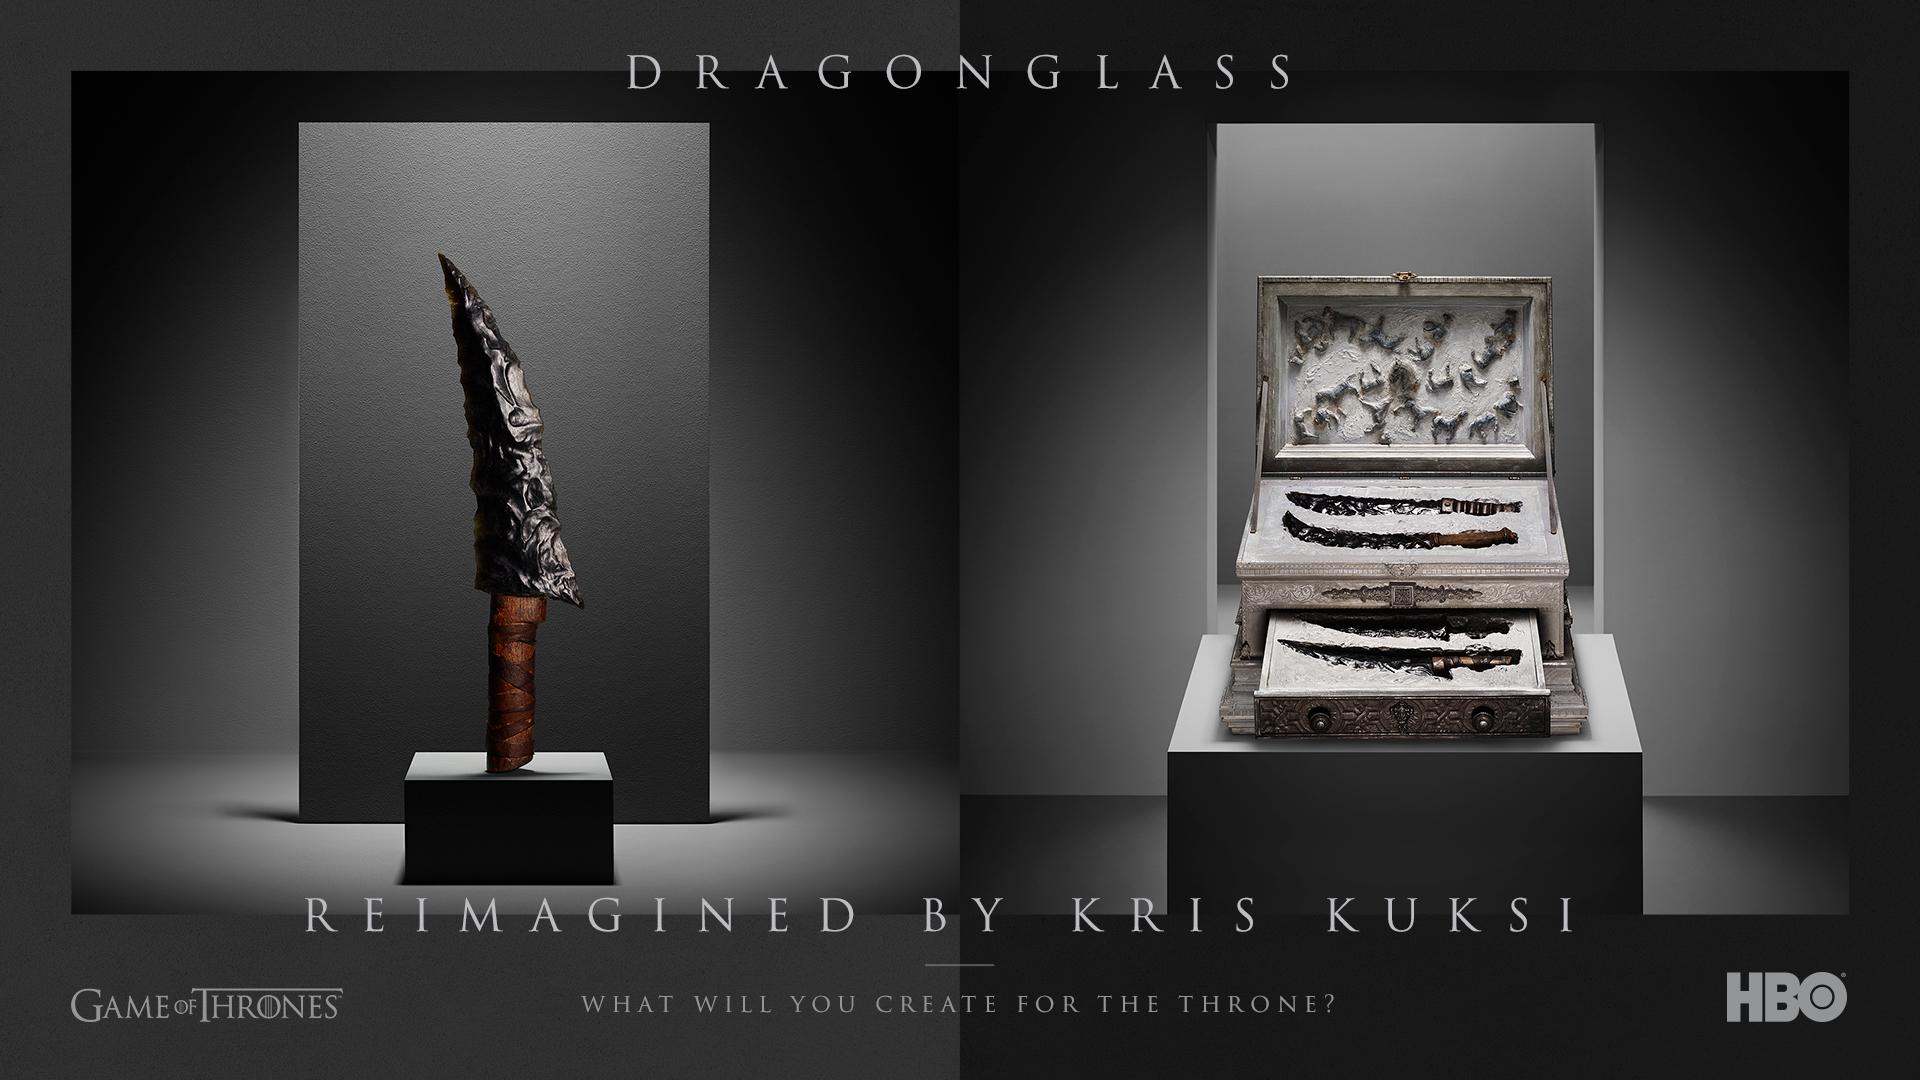 07_NOTW_Dragonglass_Kris_Kuksi.jpg